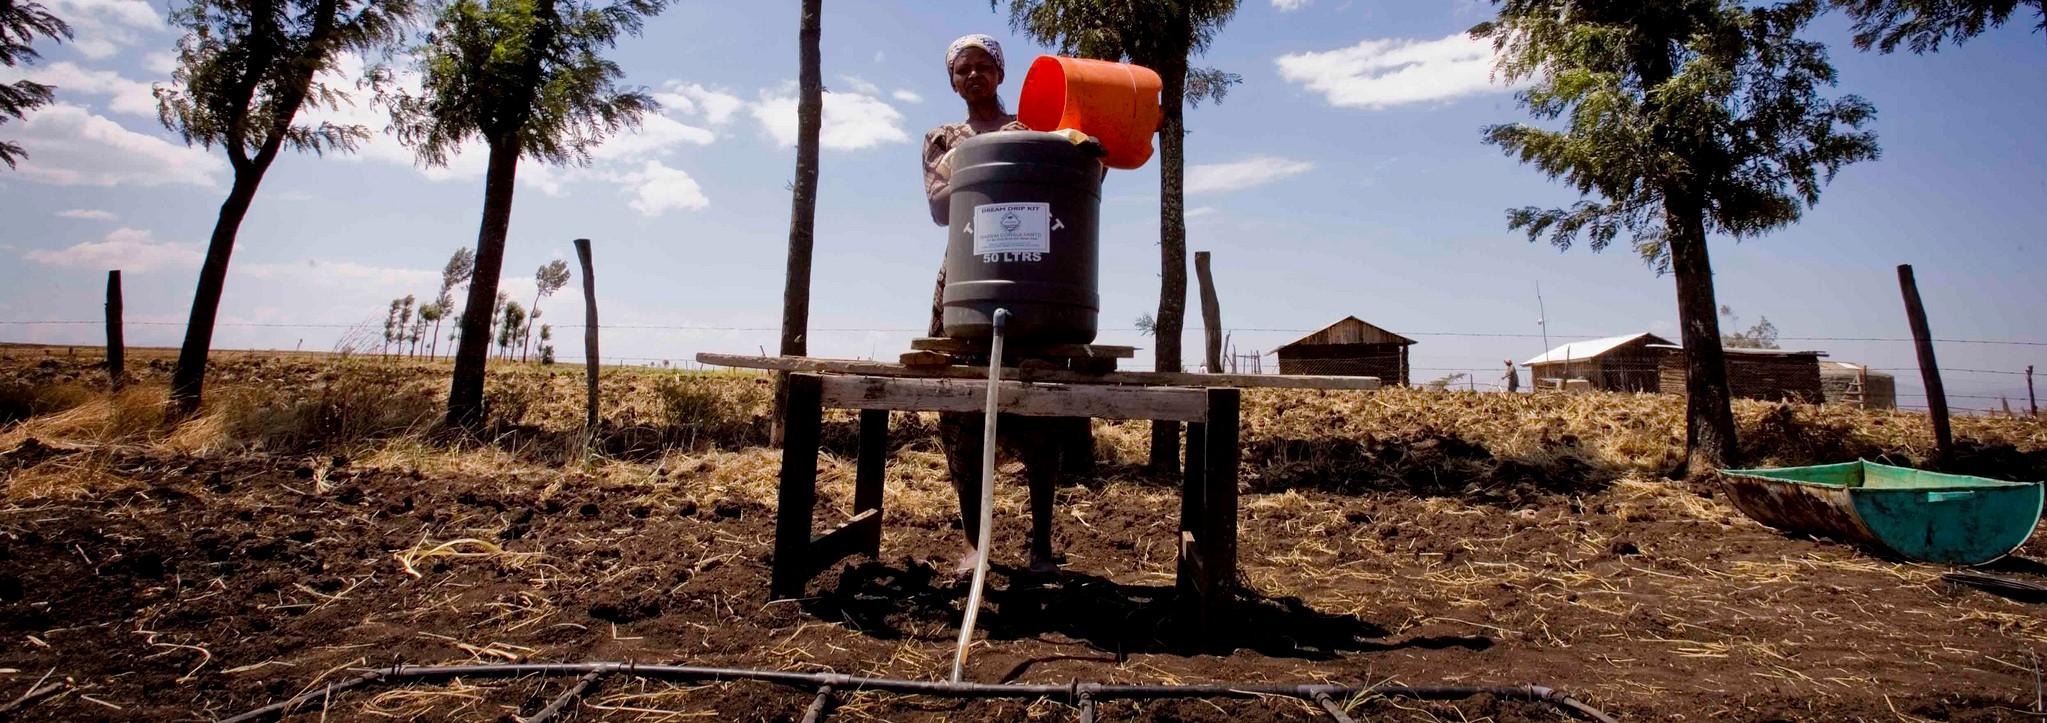 The AusAid Self Help Development Initiative helped Kenyans like Beth Wanjero irrigate using a drip watering kit. (Photo: Flickr/DFAT/2009)